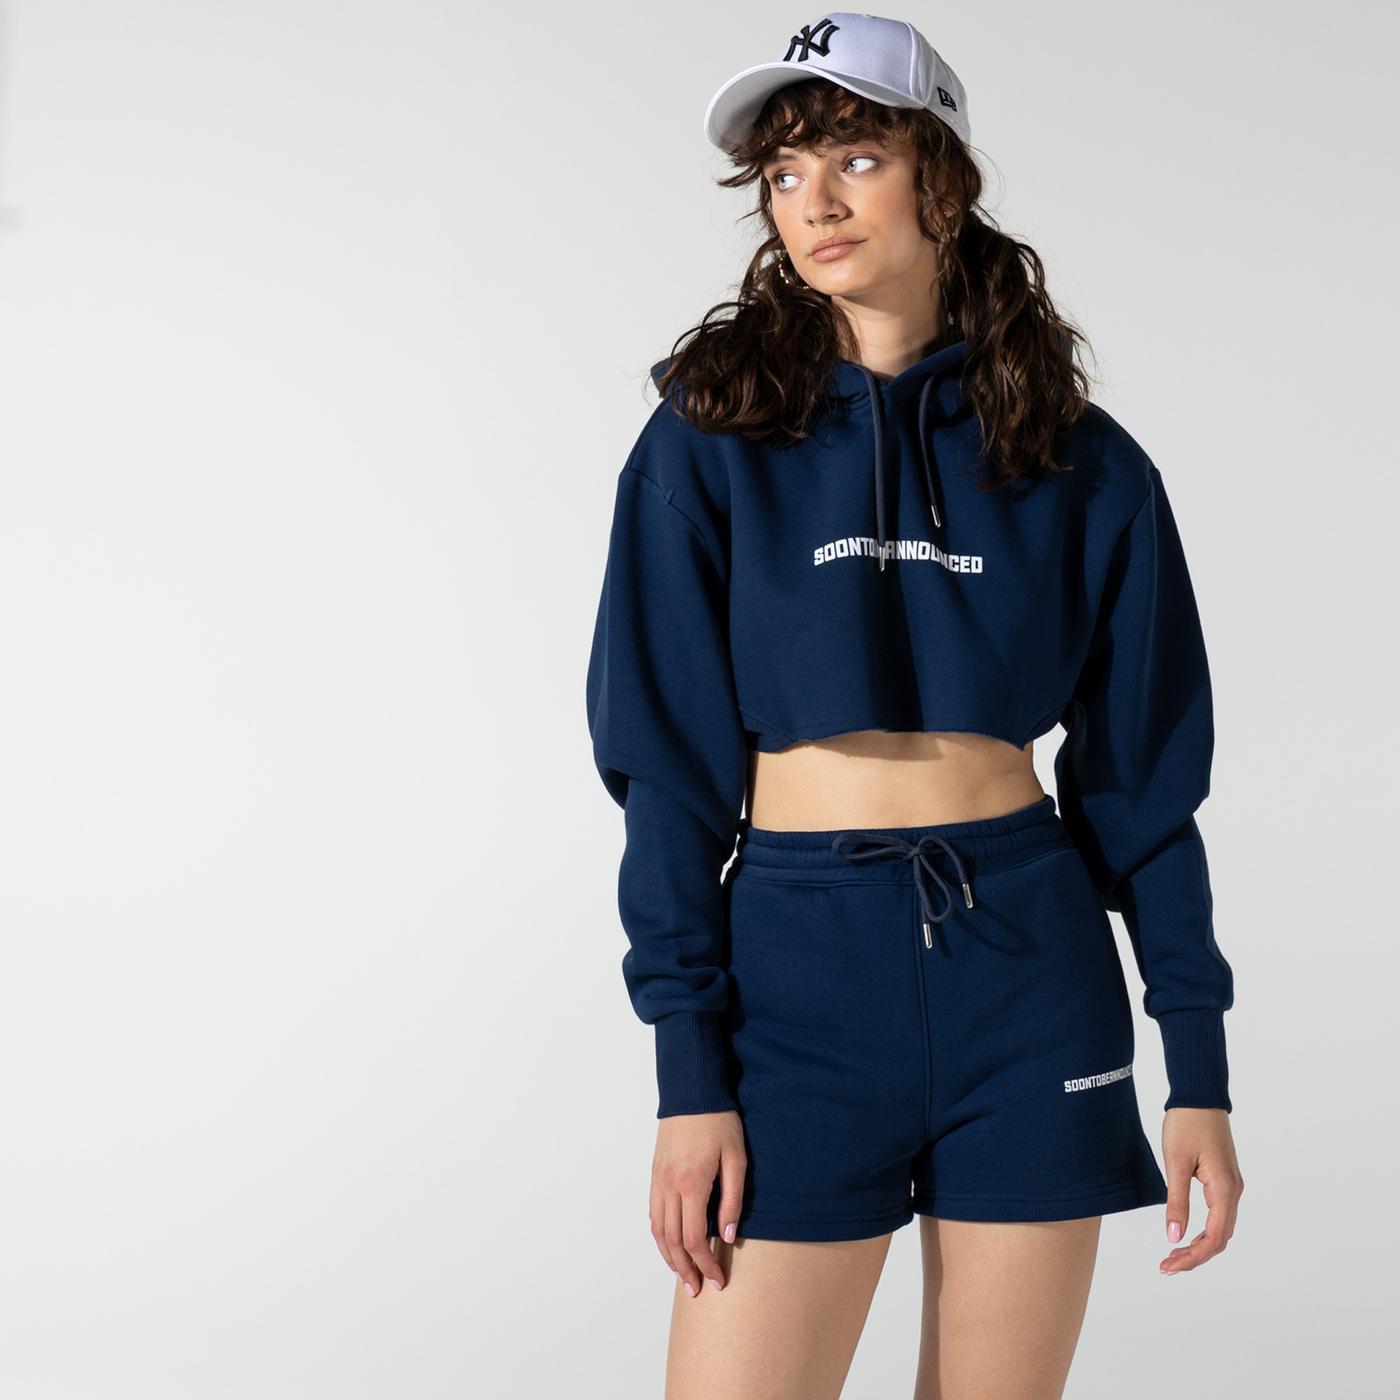 Soon To Be Announced Logo Printed Crop Lacivert Kadın Kapüşonlu Sweatshirt